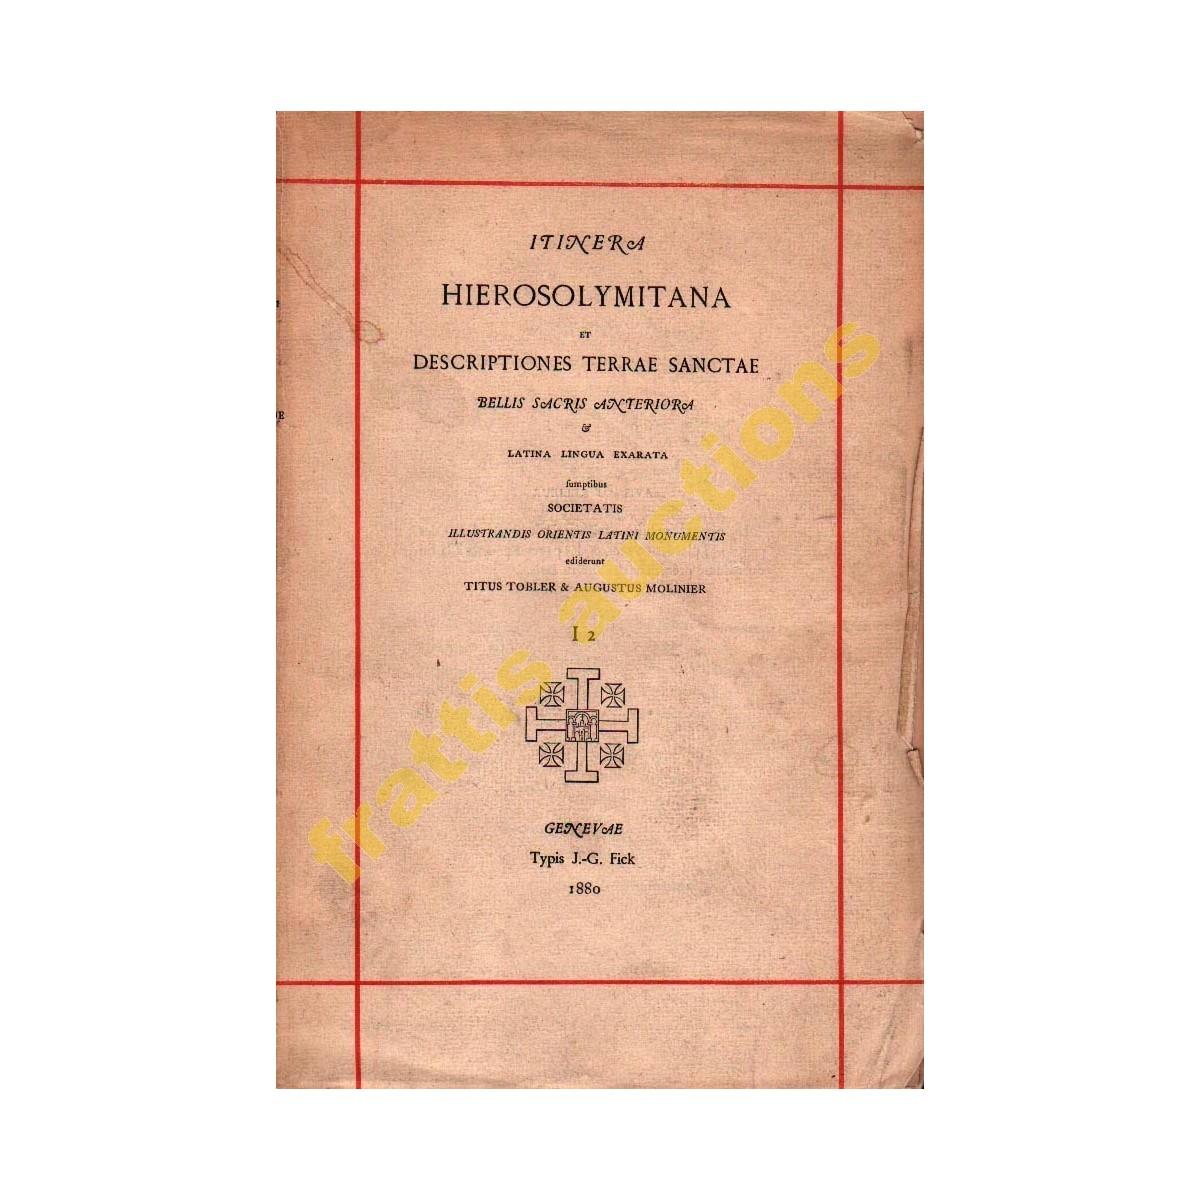 Hierosolymitana, Anteriora, 1880.